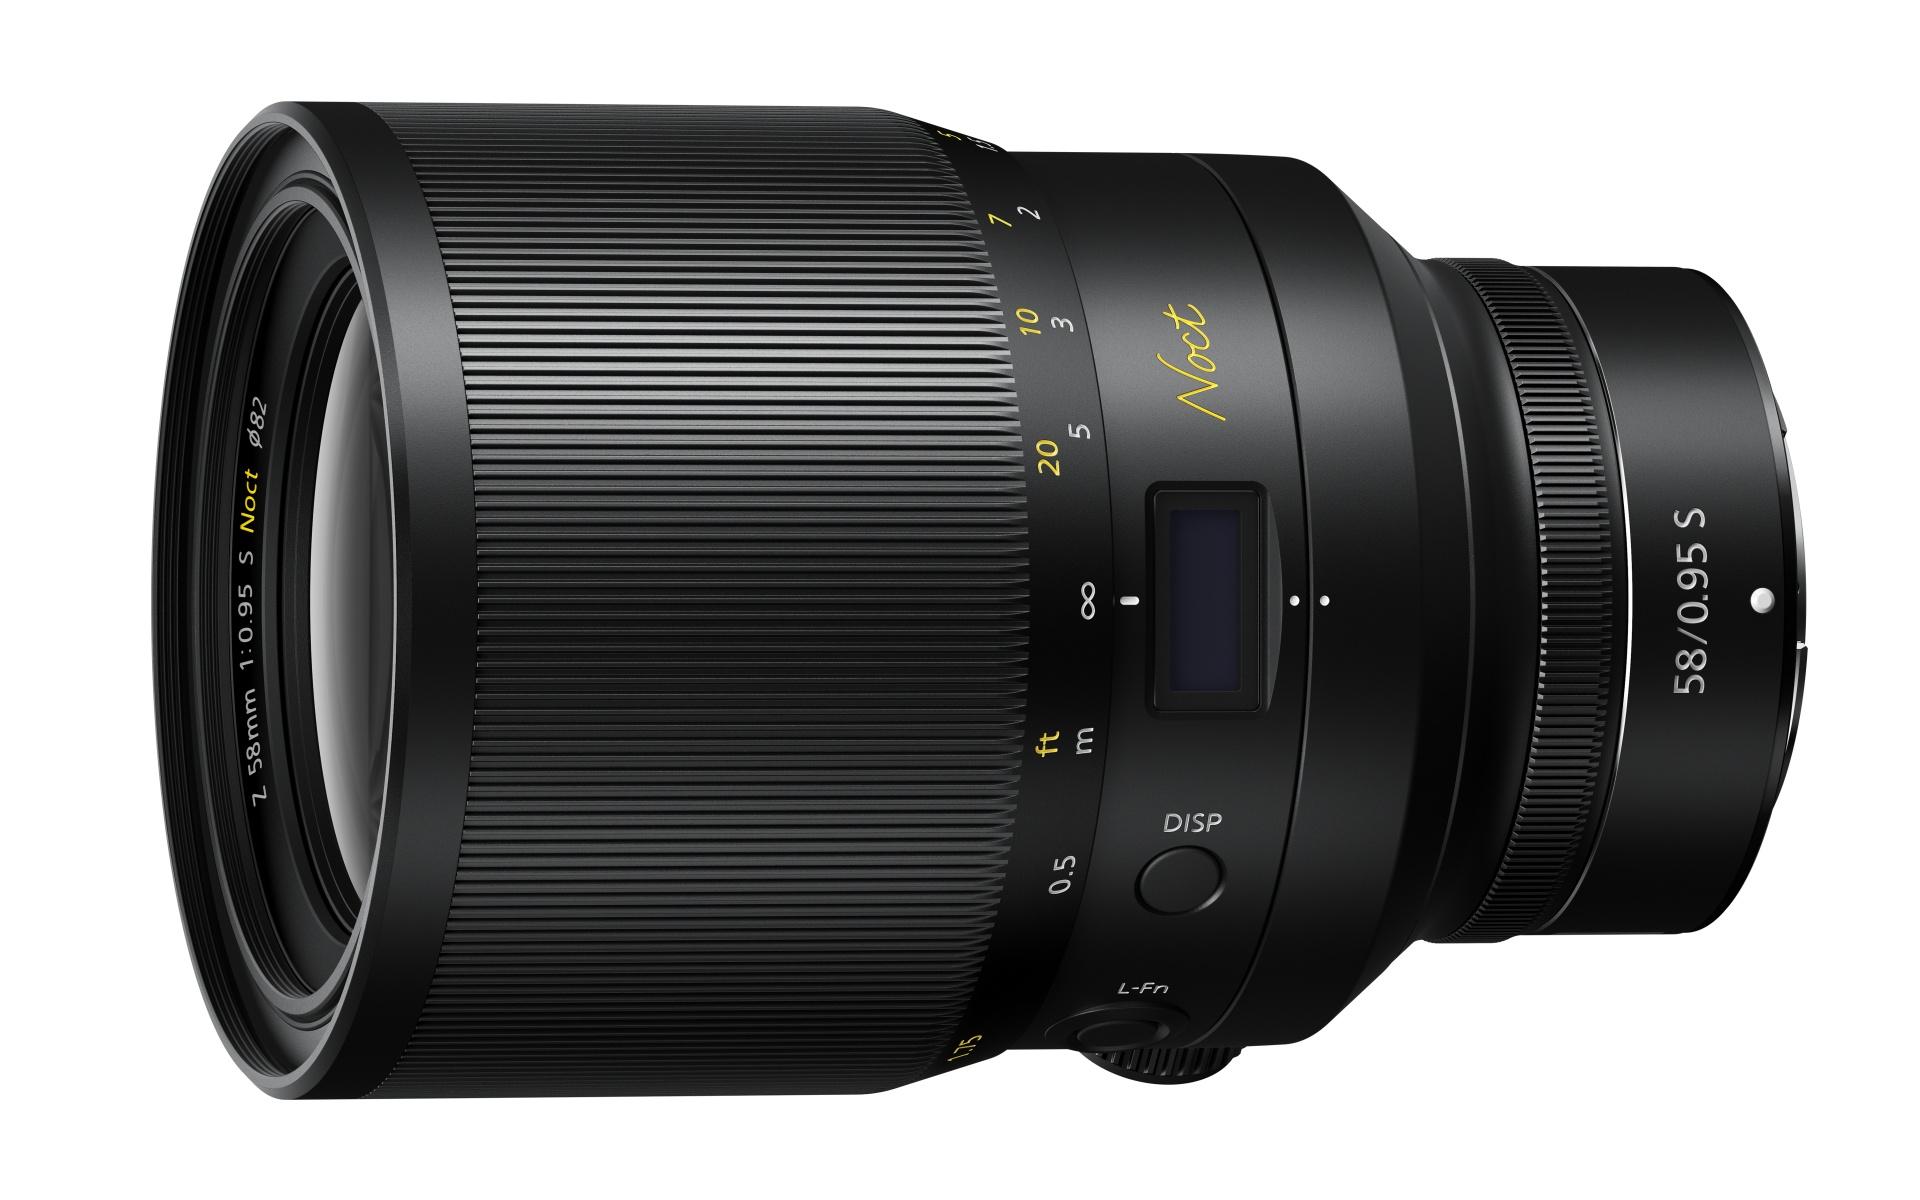 NikkorZ 58mm f/0,95 S Noct